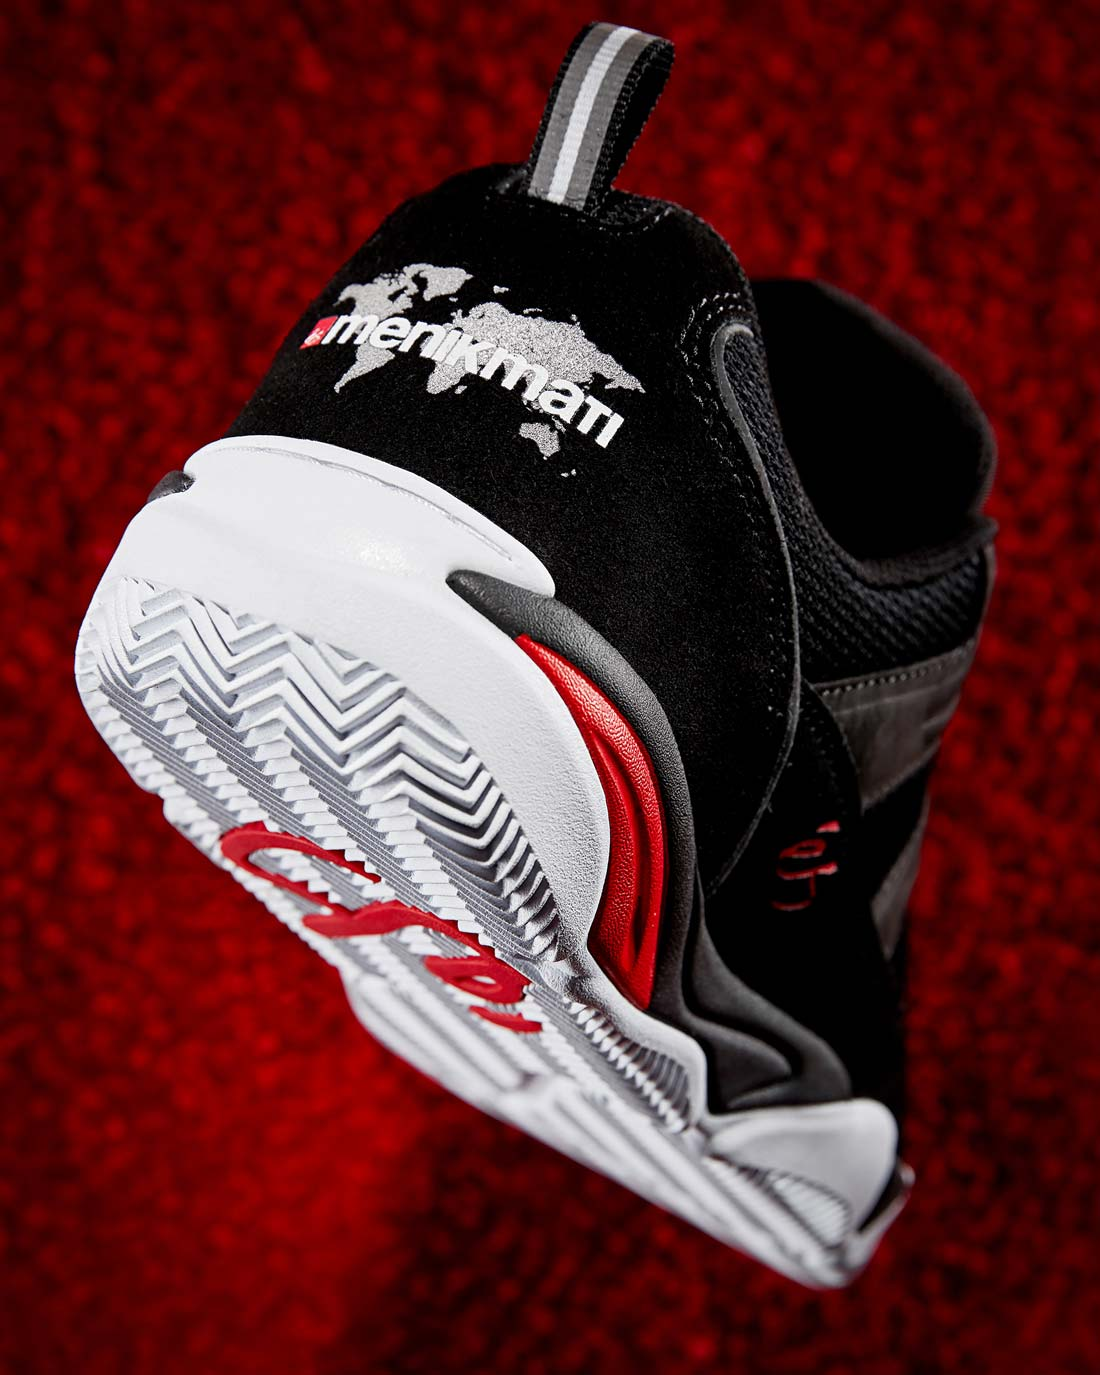 eS Menikmati Silo skate shoes